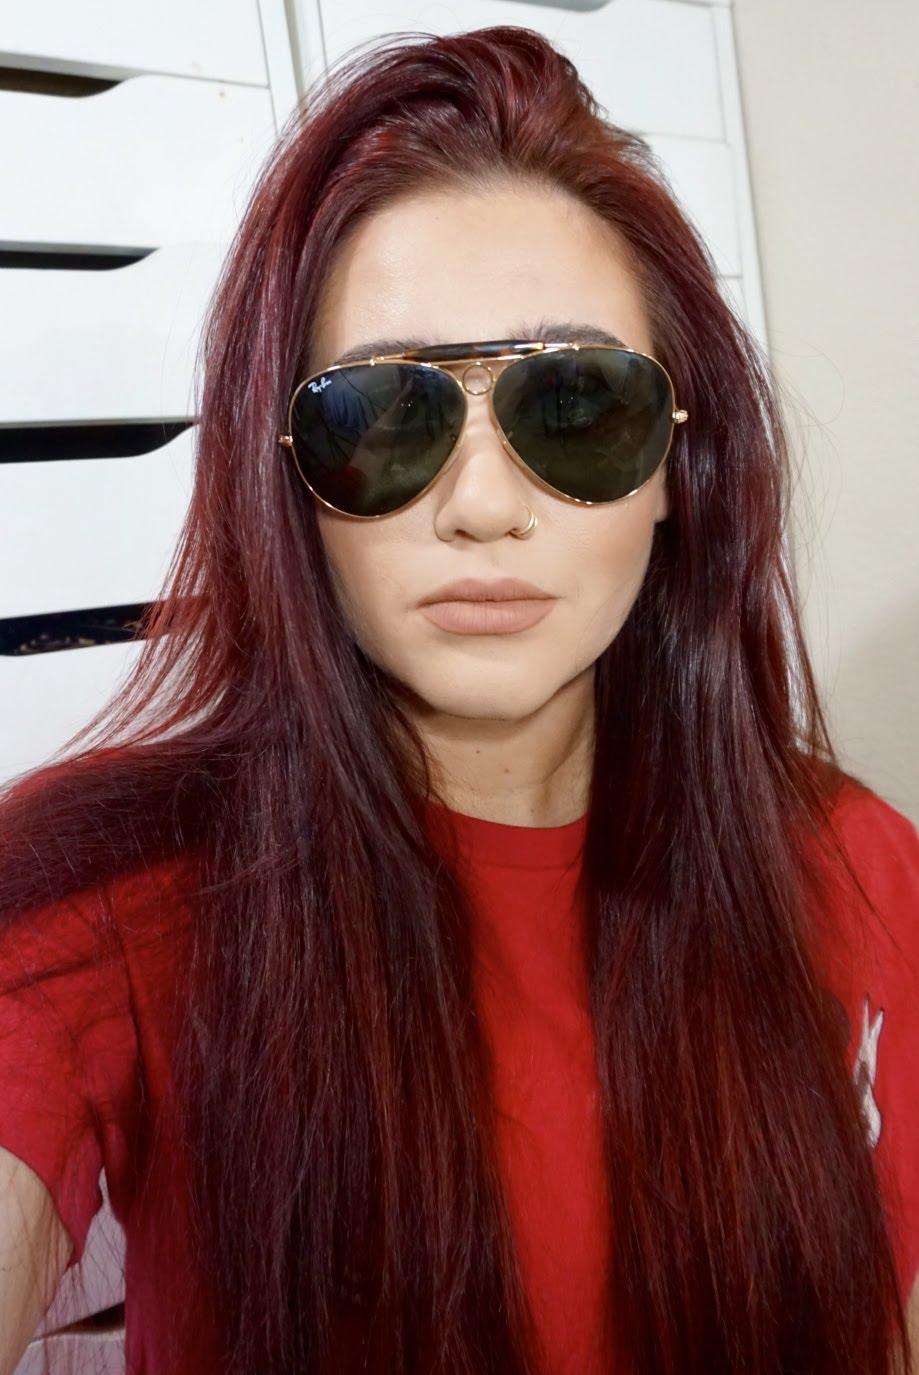 pilot aviator rayban sunglasses